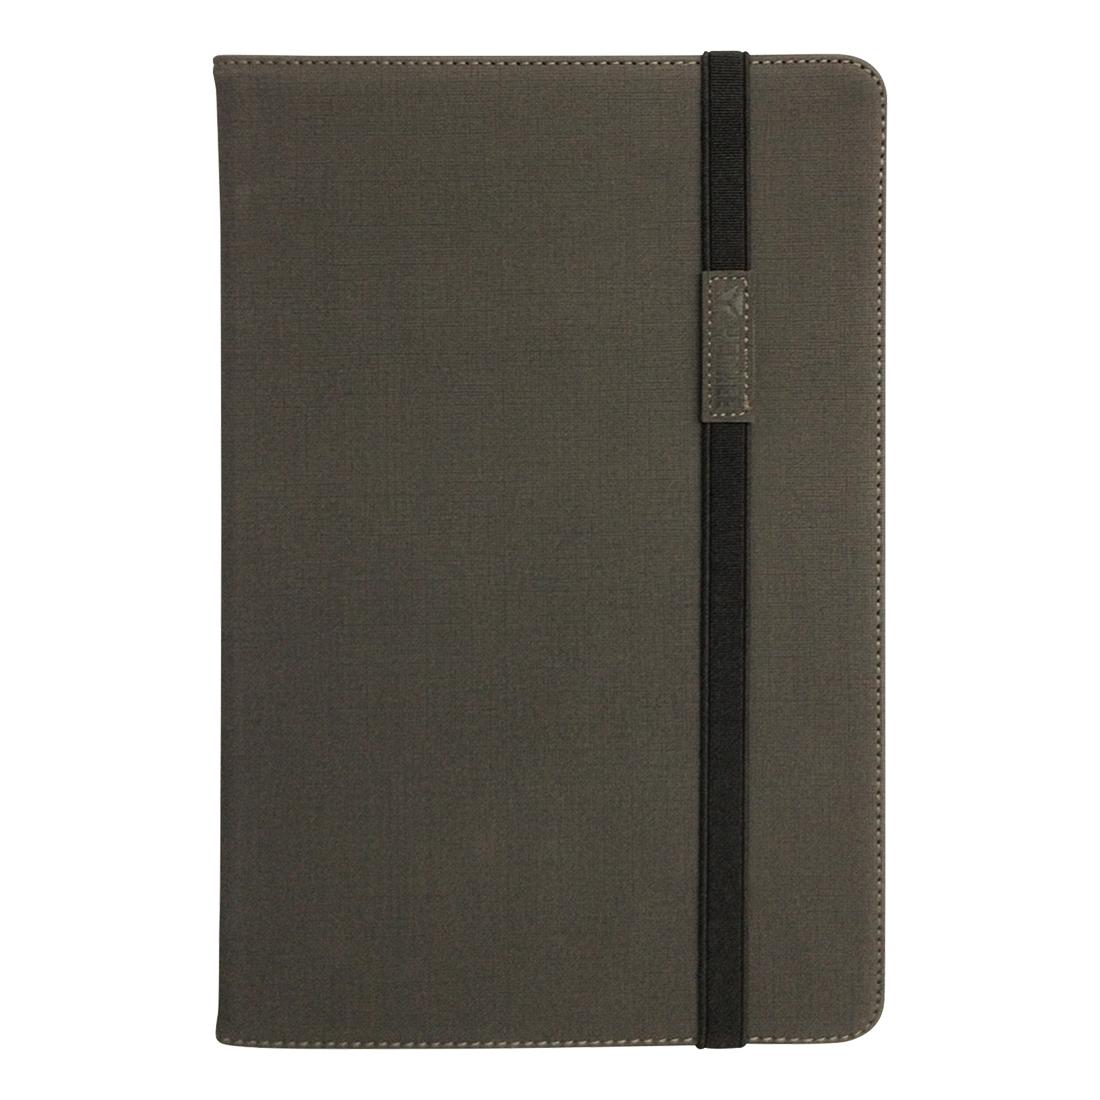 Yenkee Universal Θήκη & Stand for Tablets 10.1'' - Black (1015BK)